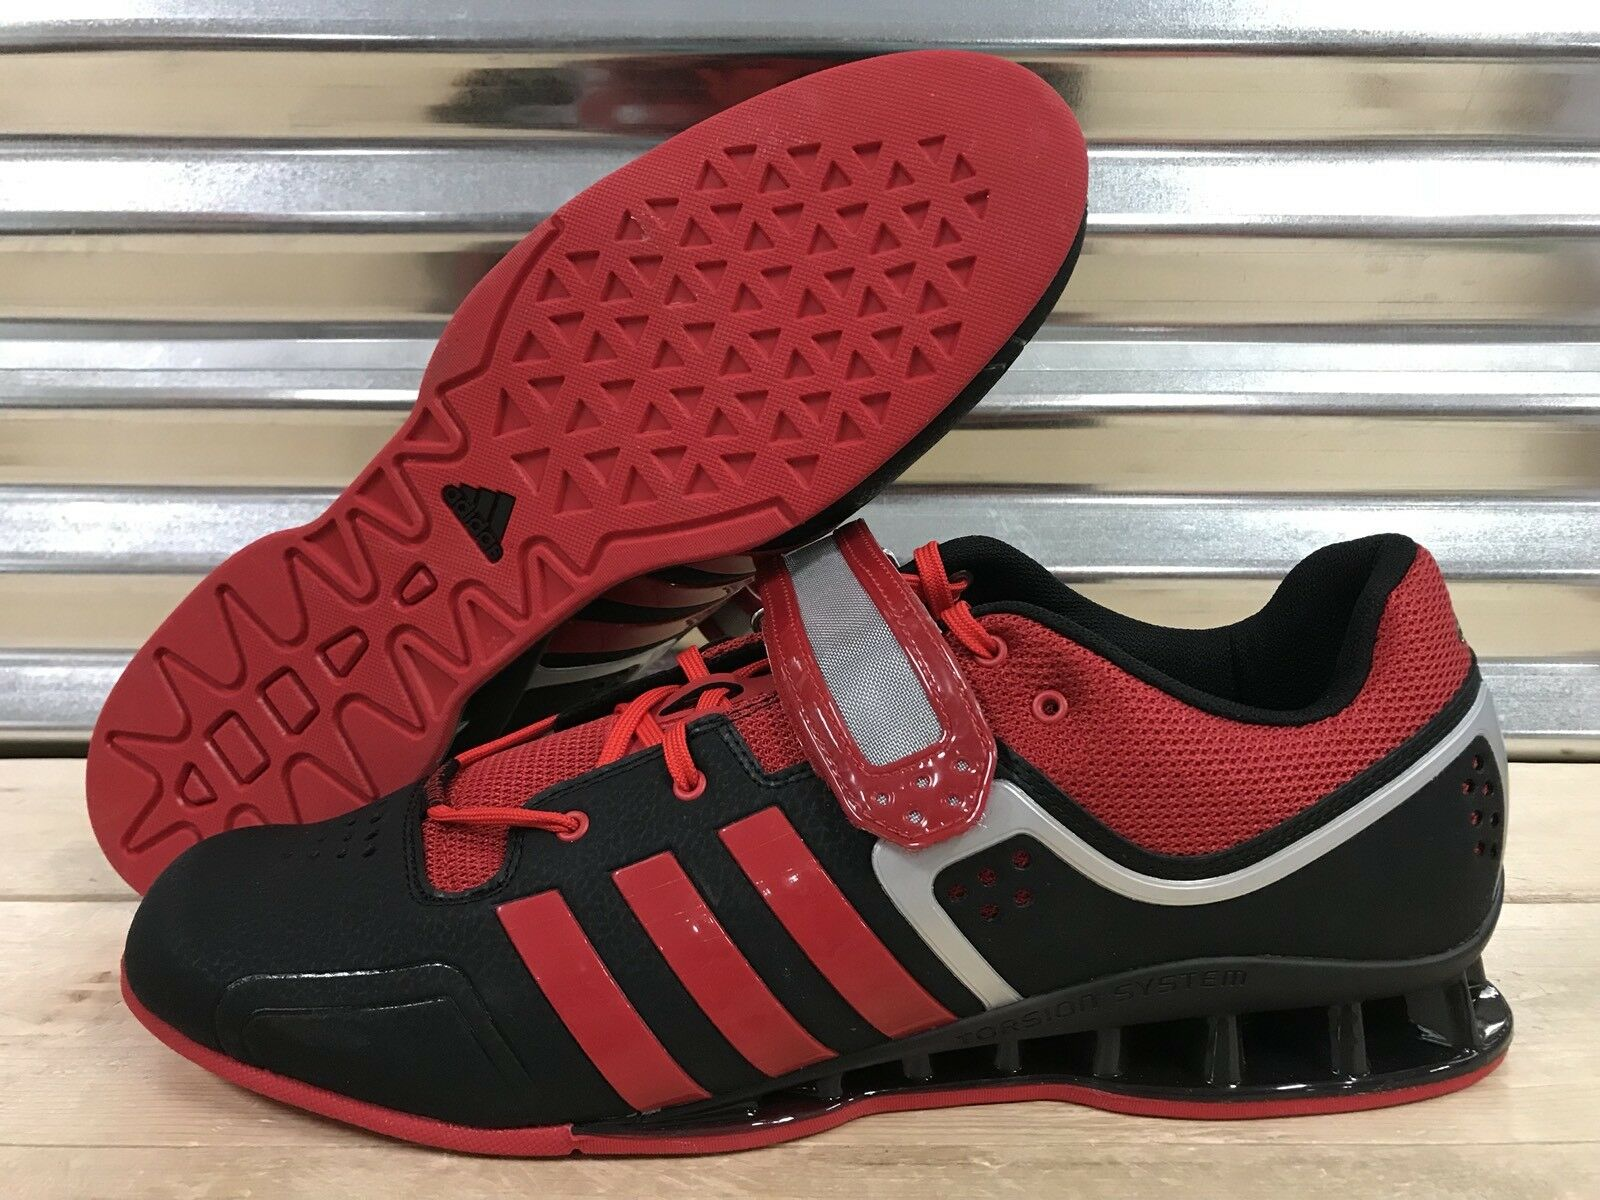 "465db0fb1618b Adidas Adipower Weightlifting Crossfit Zapatillas Negro Rojo Tamaño  (M21865) (M21865) (M21865. """